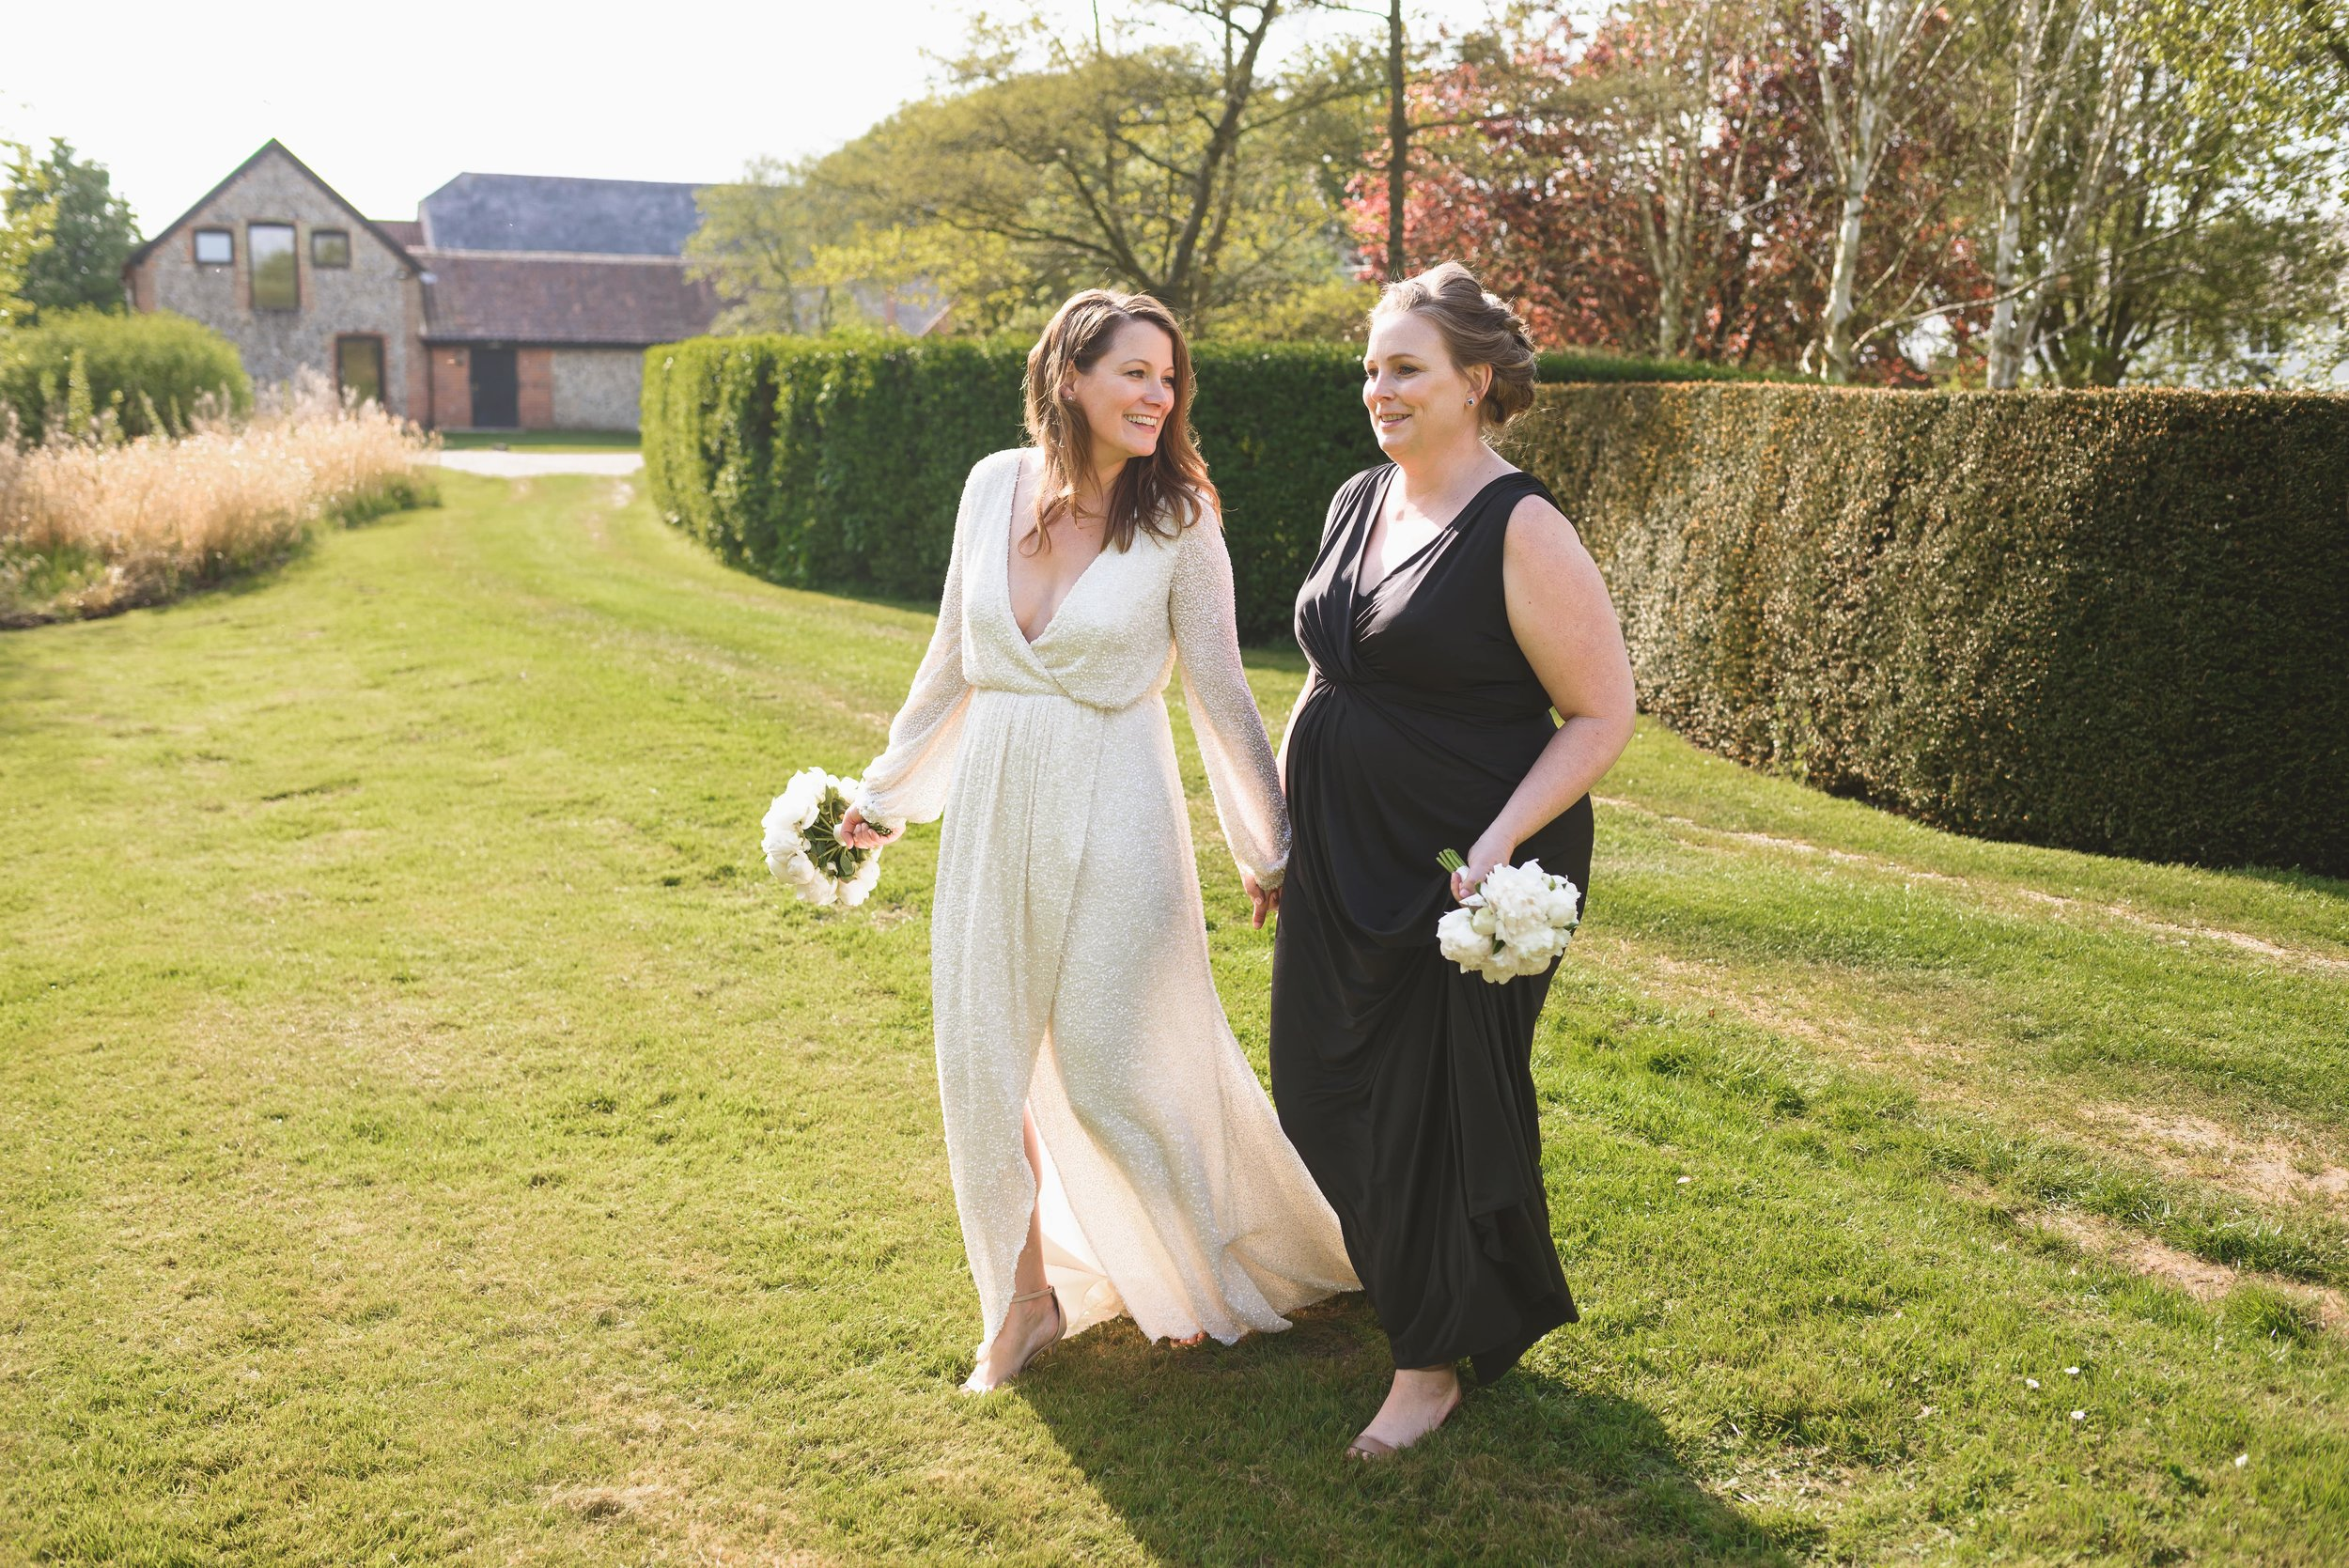 The Granary Estates Wedding Photographer - Jackson & Co Photography00465-min.JPG